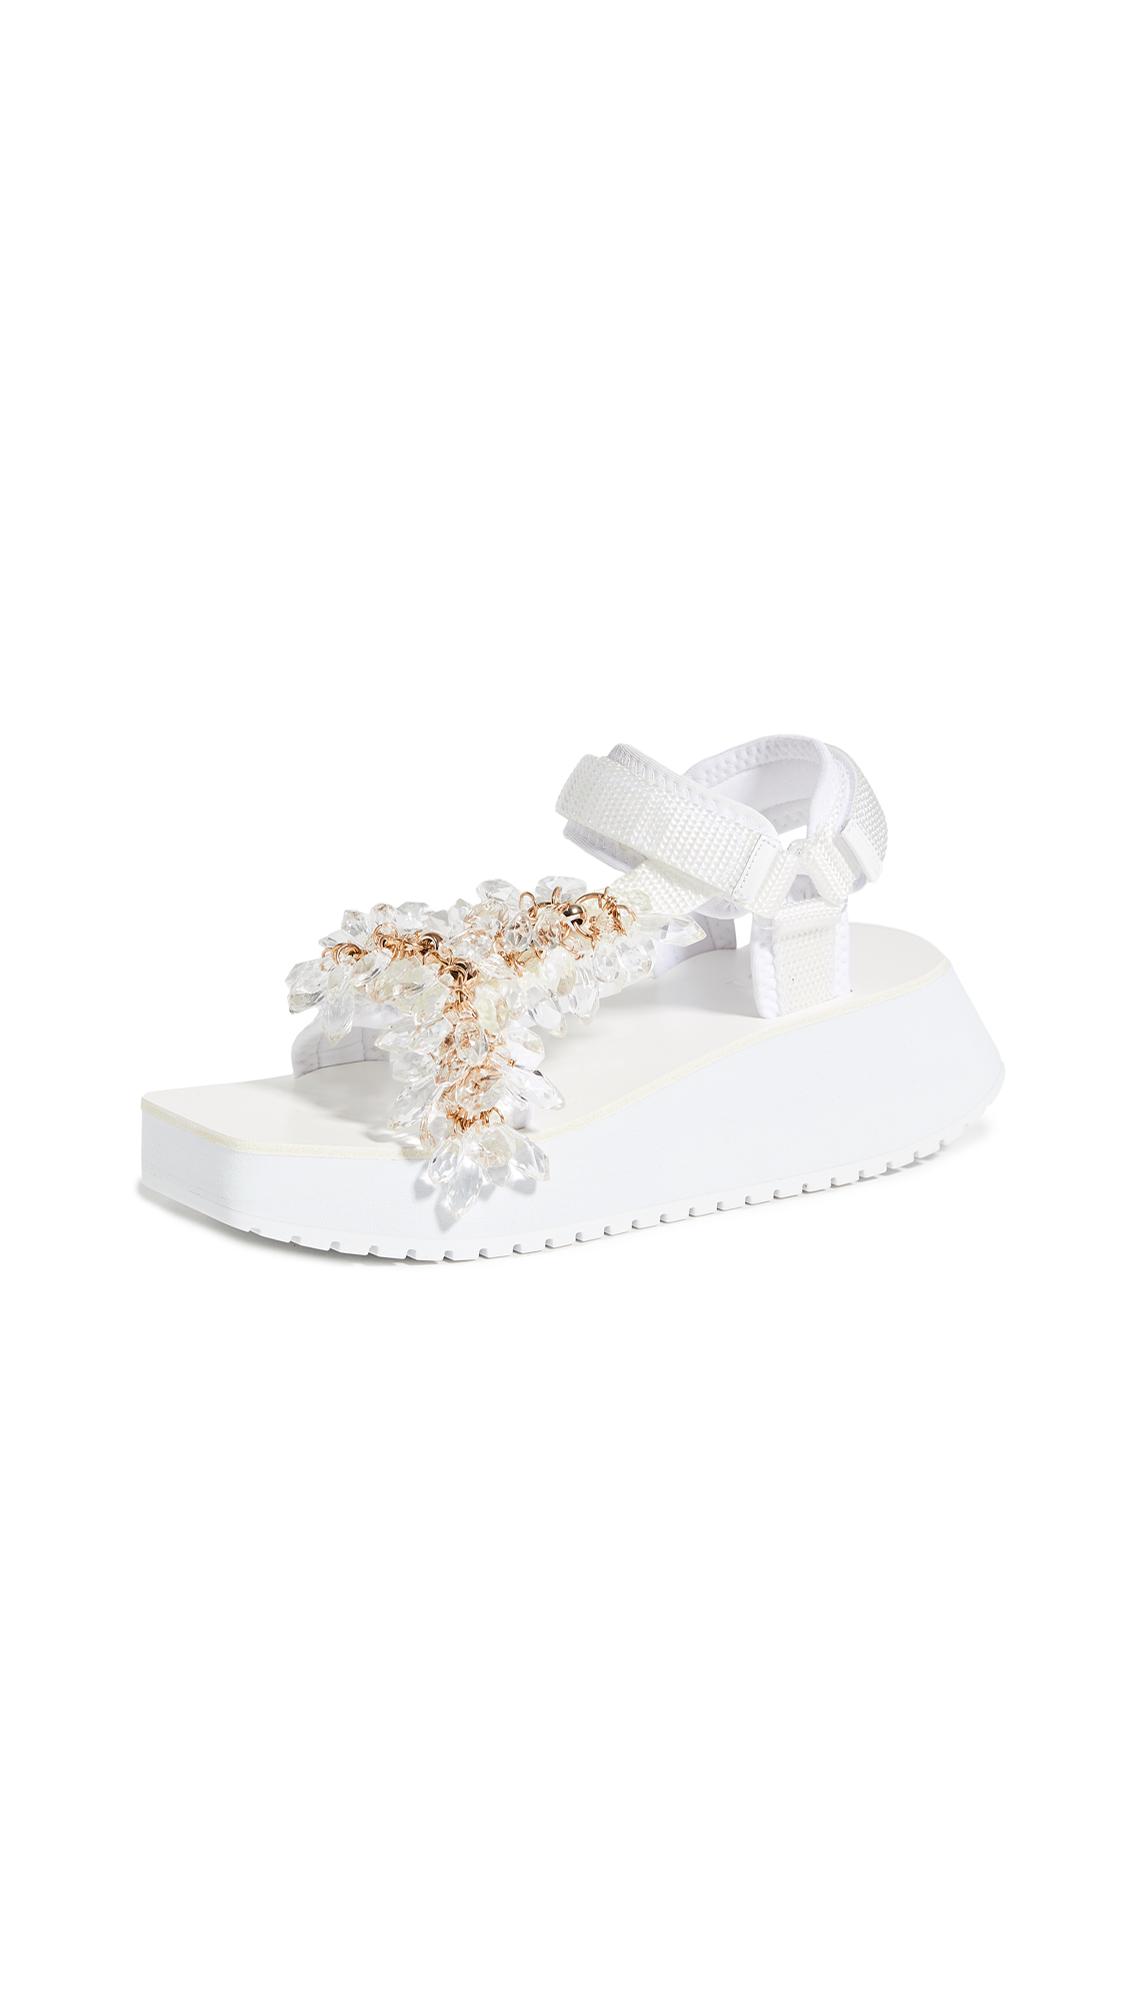 Buy Tibi Ping Jeweled Sandals online, shop Tibi